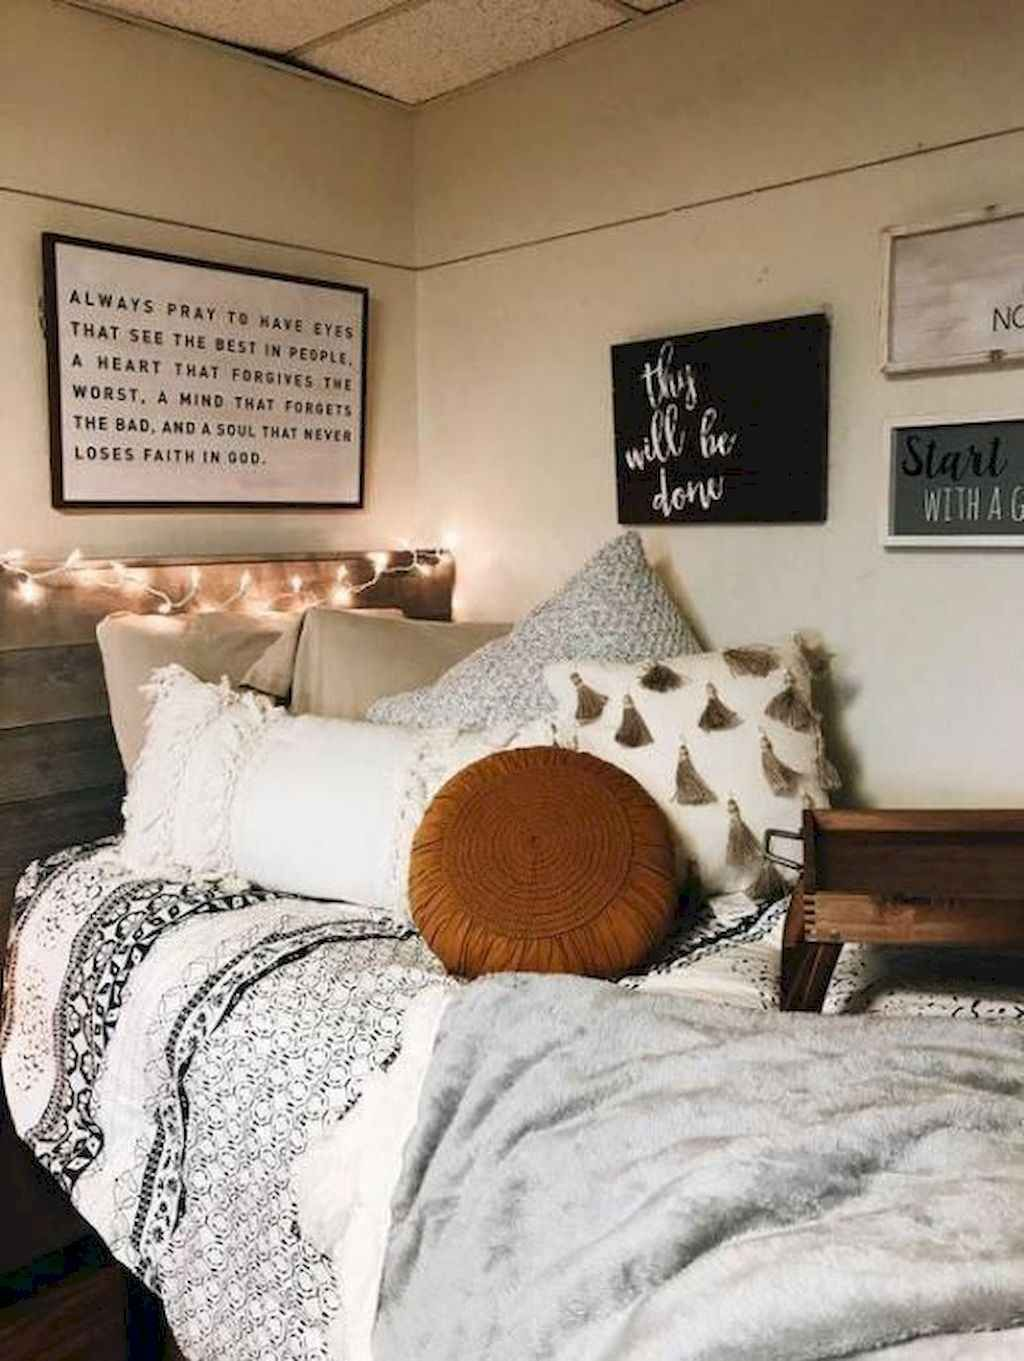 Dream Dorm Room: 09 DIY Dorm Room Decorating Ideas On A Budget In 2020